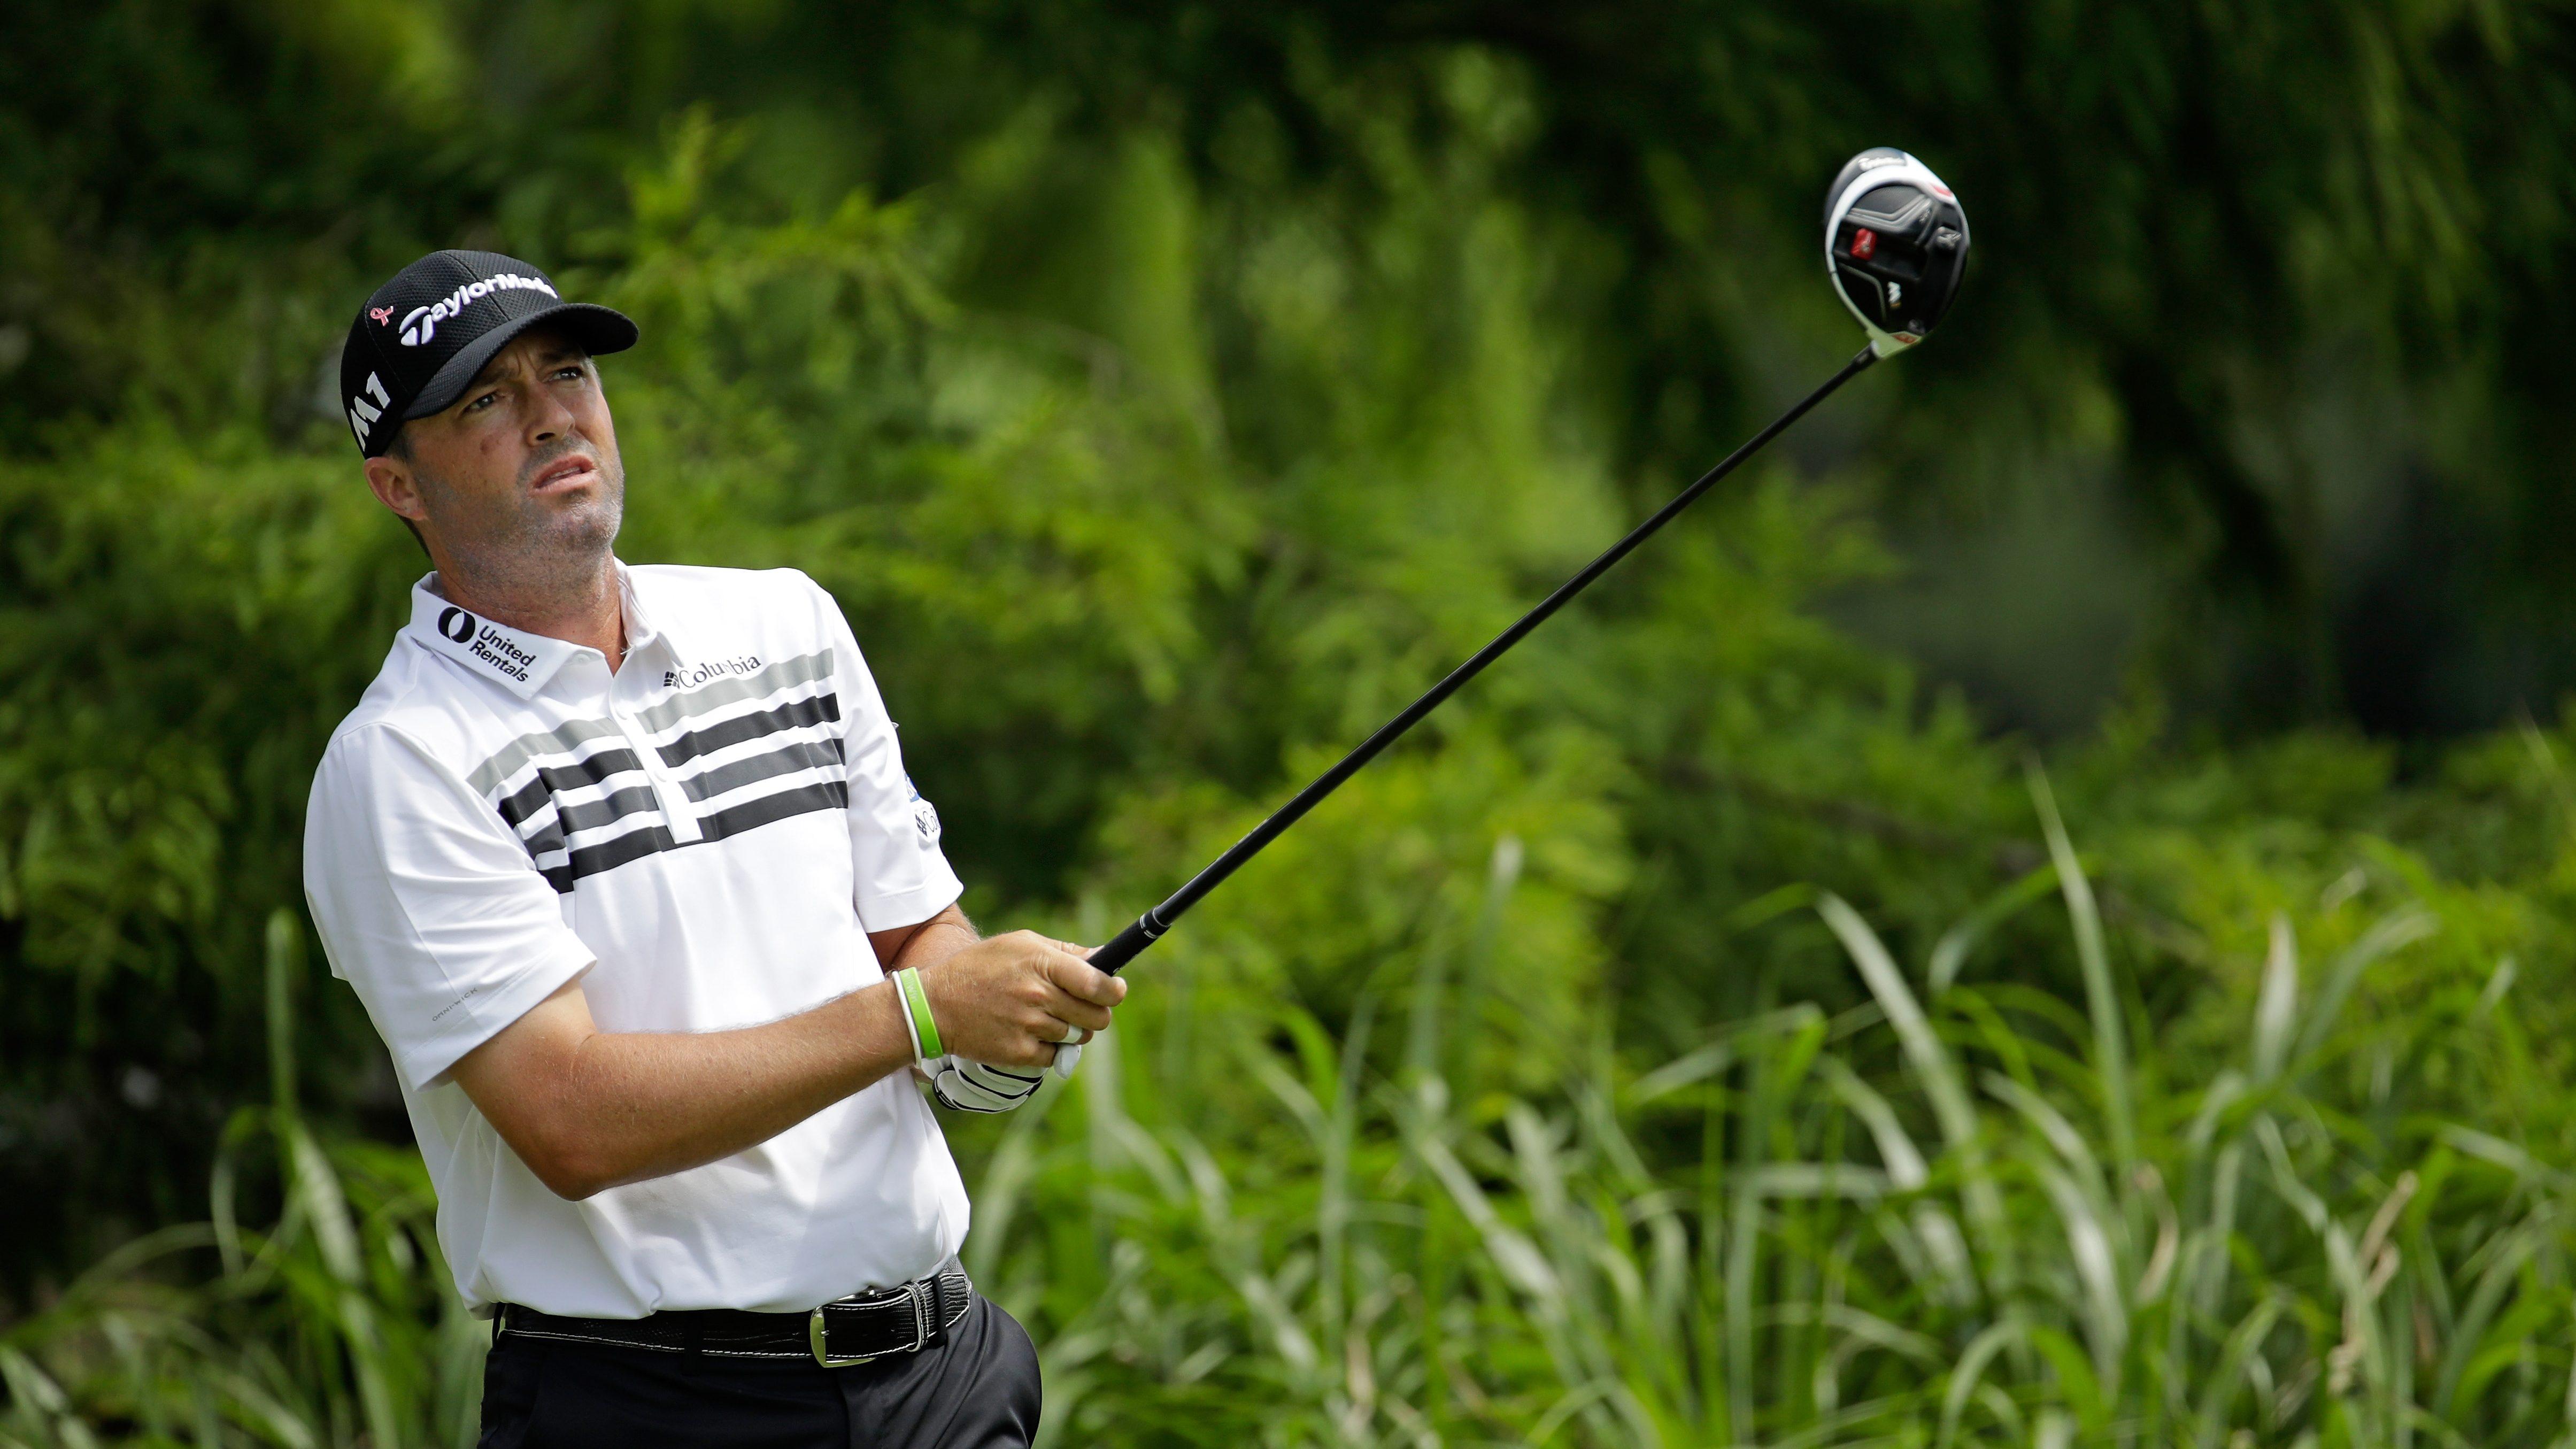 Ryan Palmer Not Related to Arnold Palmer, but Fellow PGA Tour Pro ...